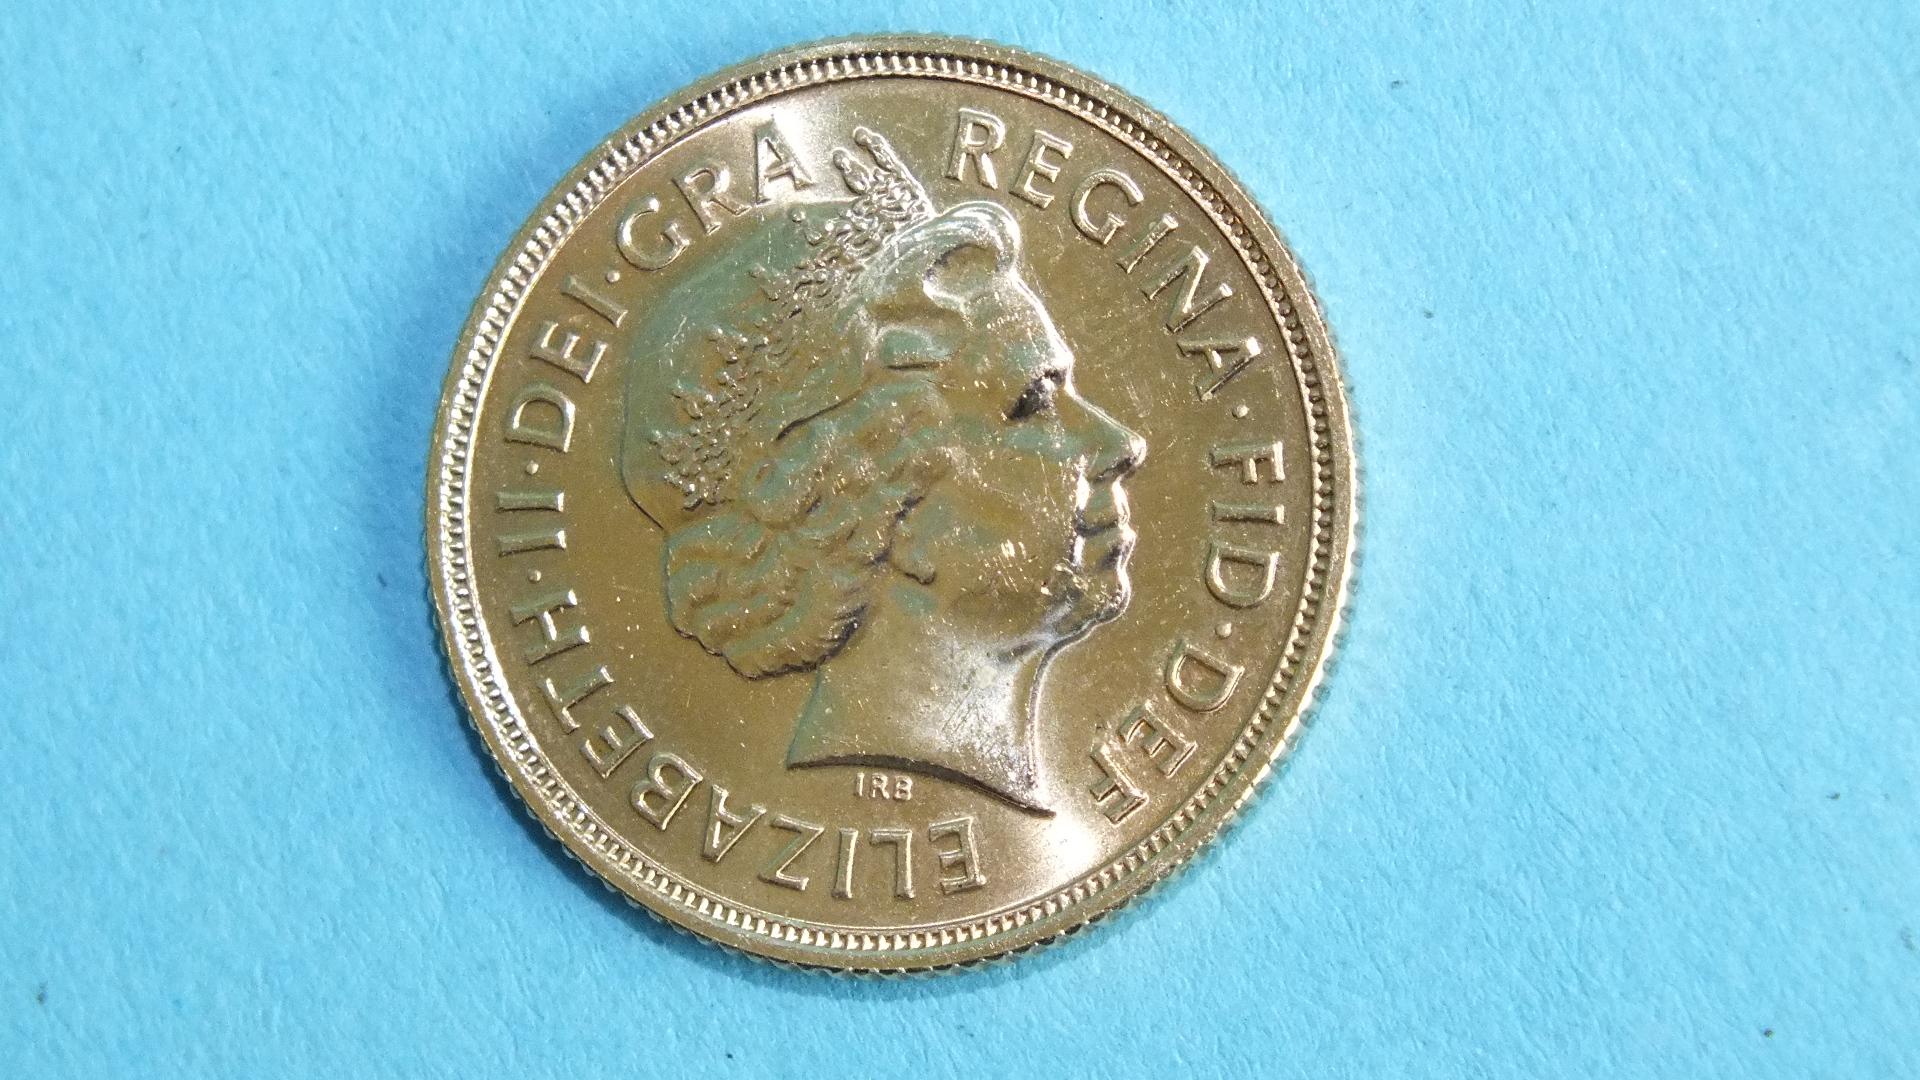 Lot 384 - An Elizabeth II 2012 sovereign.